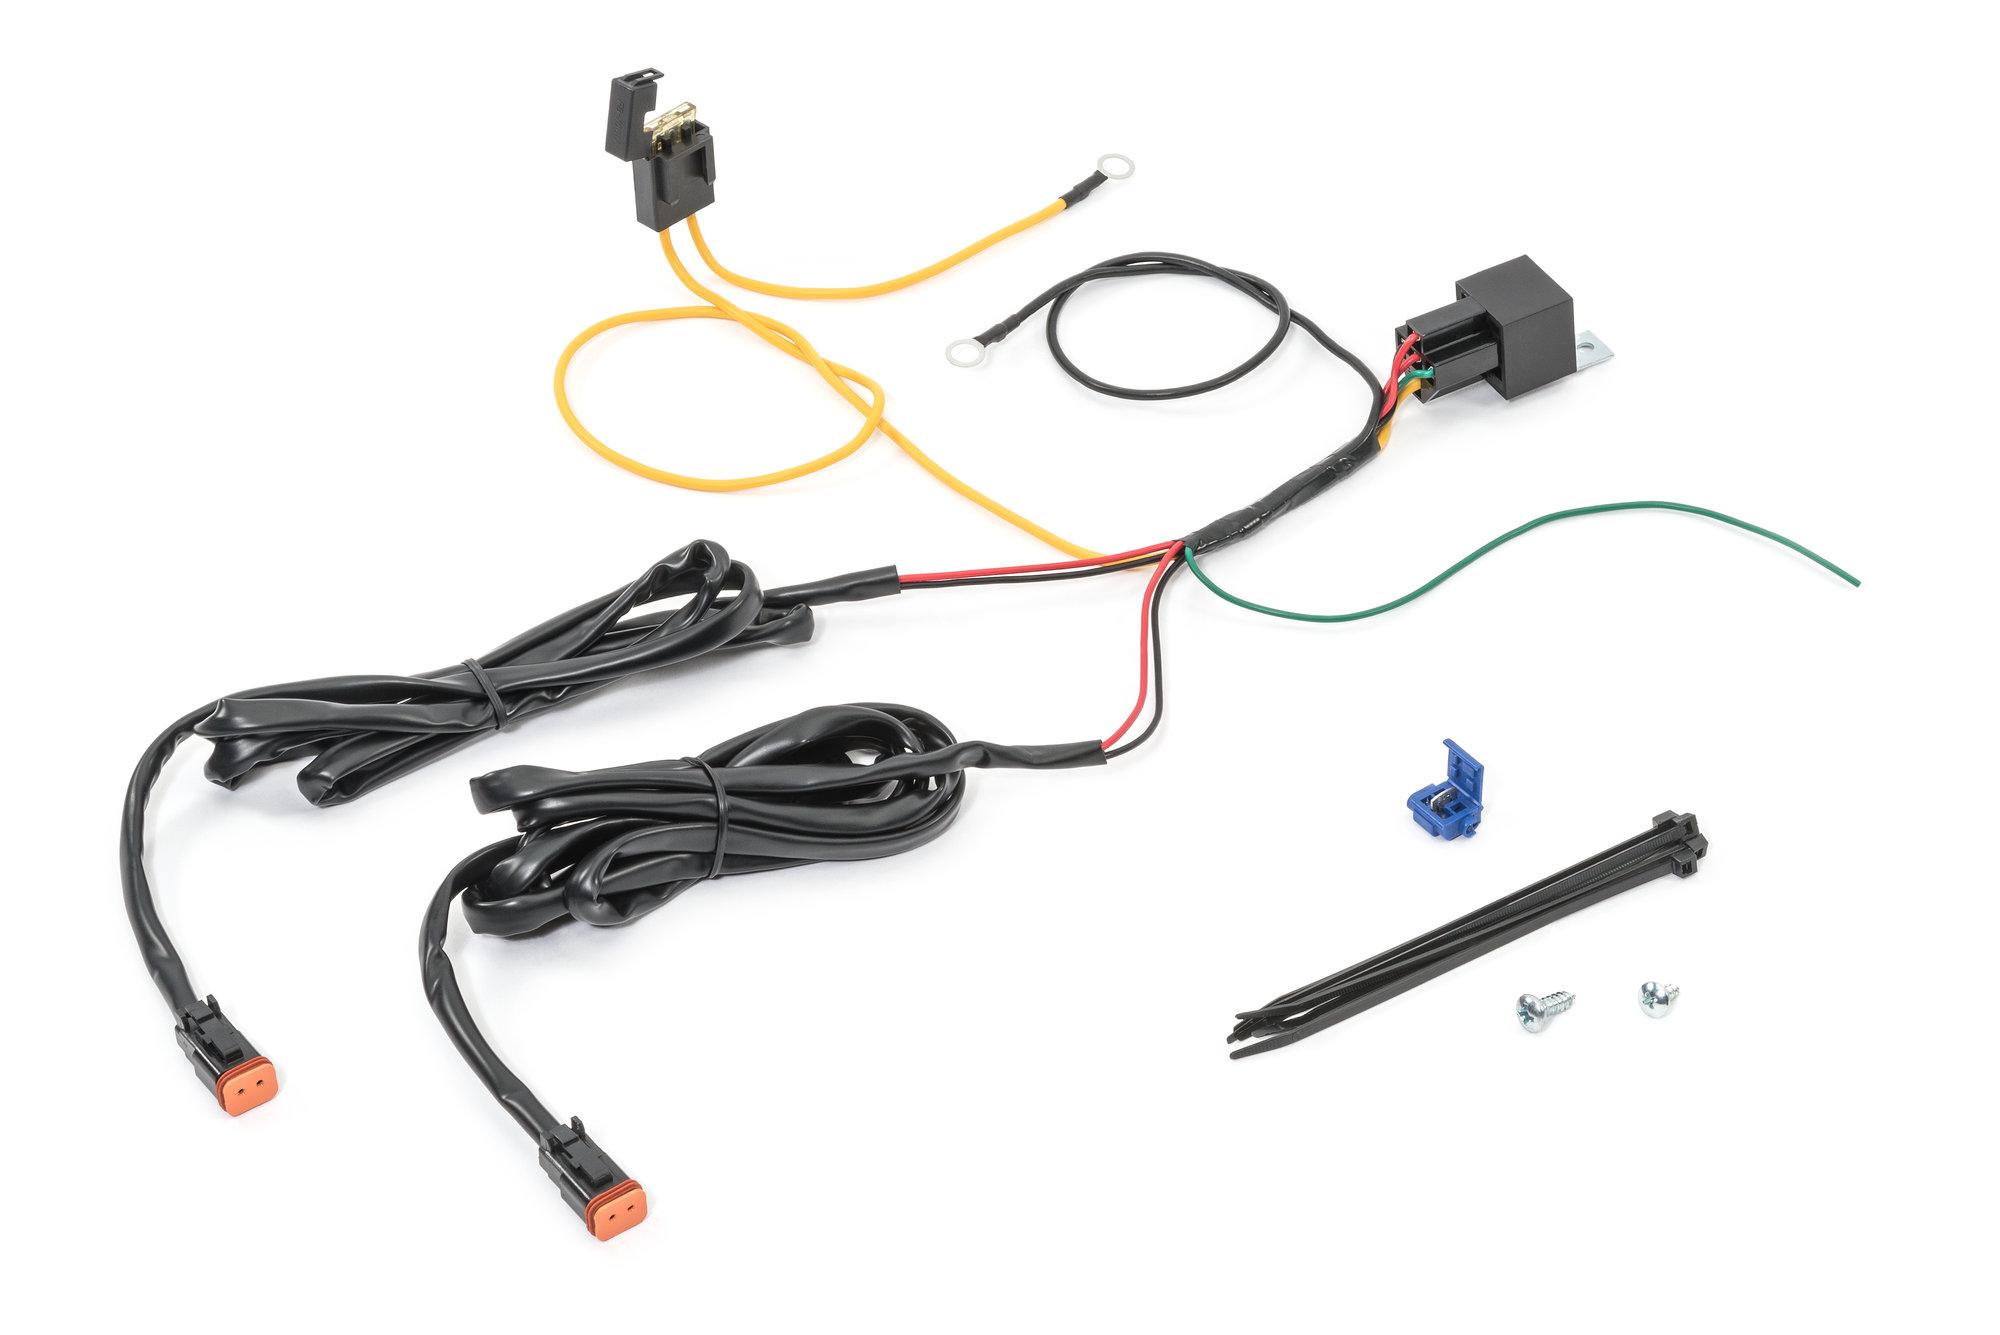 kc hilitesr 6316 addon relay wiring harness